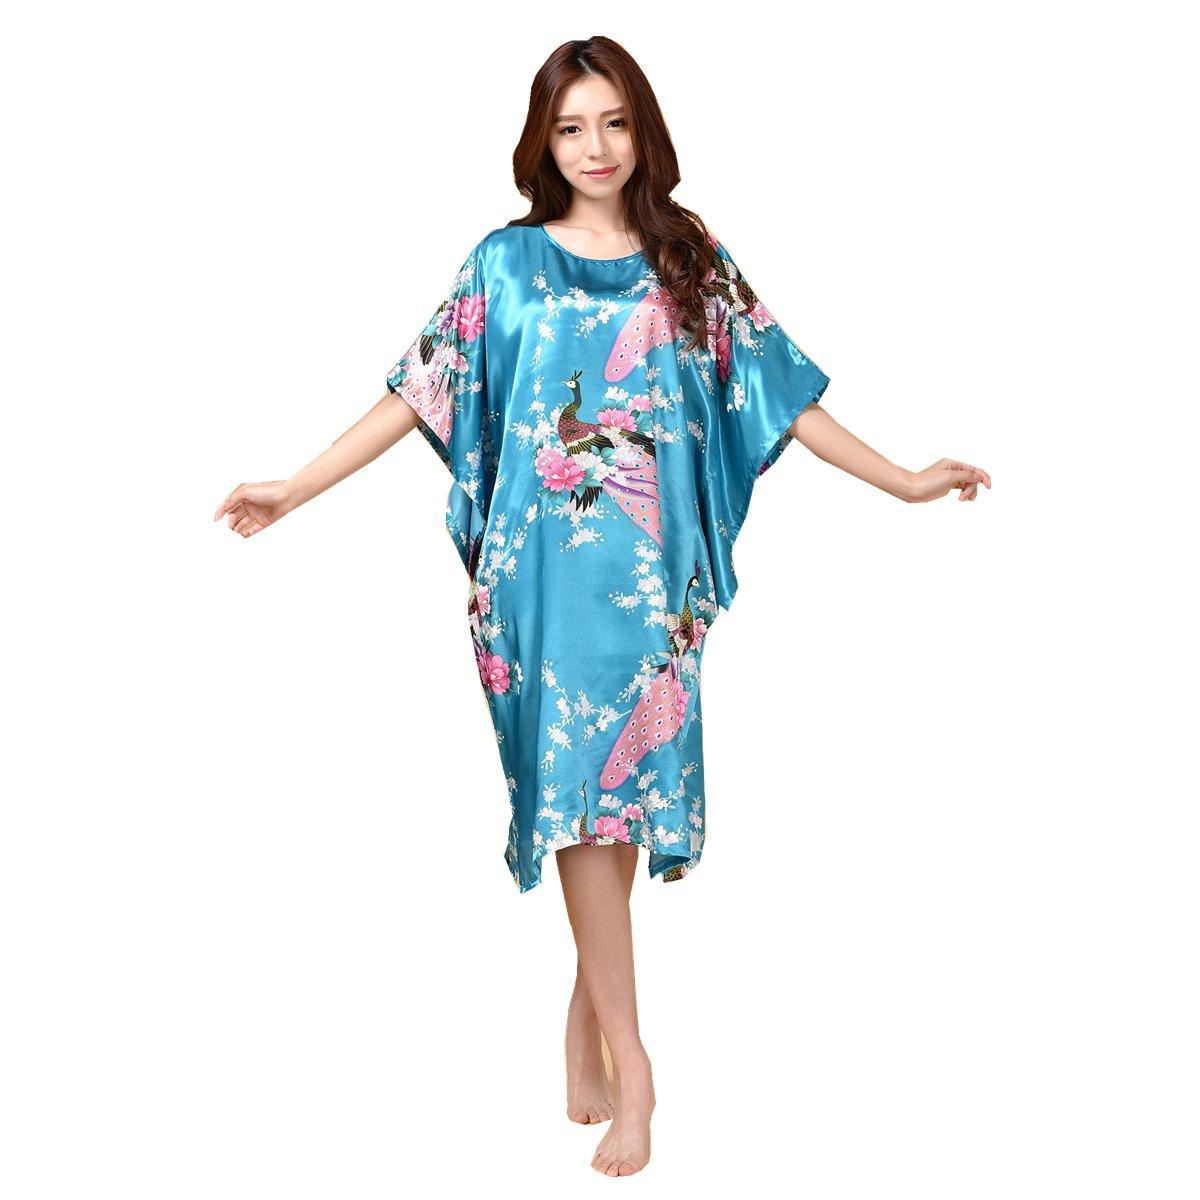 GAOLIGUO GL&G Animal pattern lady silk bathrobe thin section pajamas printing single skirt loose large yards home service comfortable Light blue bathrobes,Light blue,One size